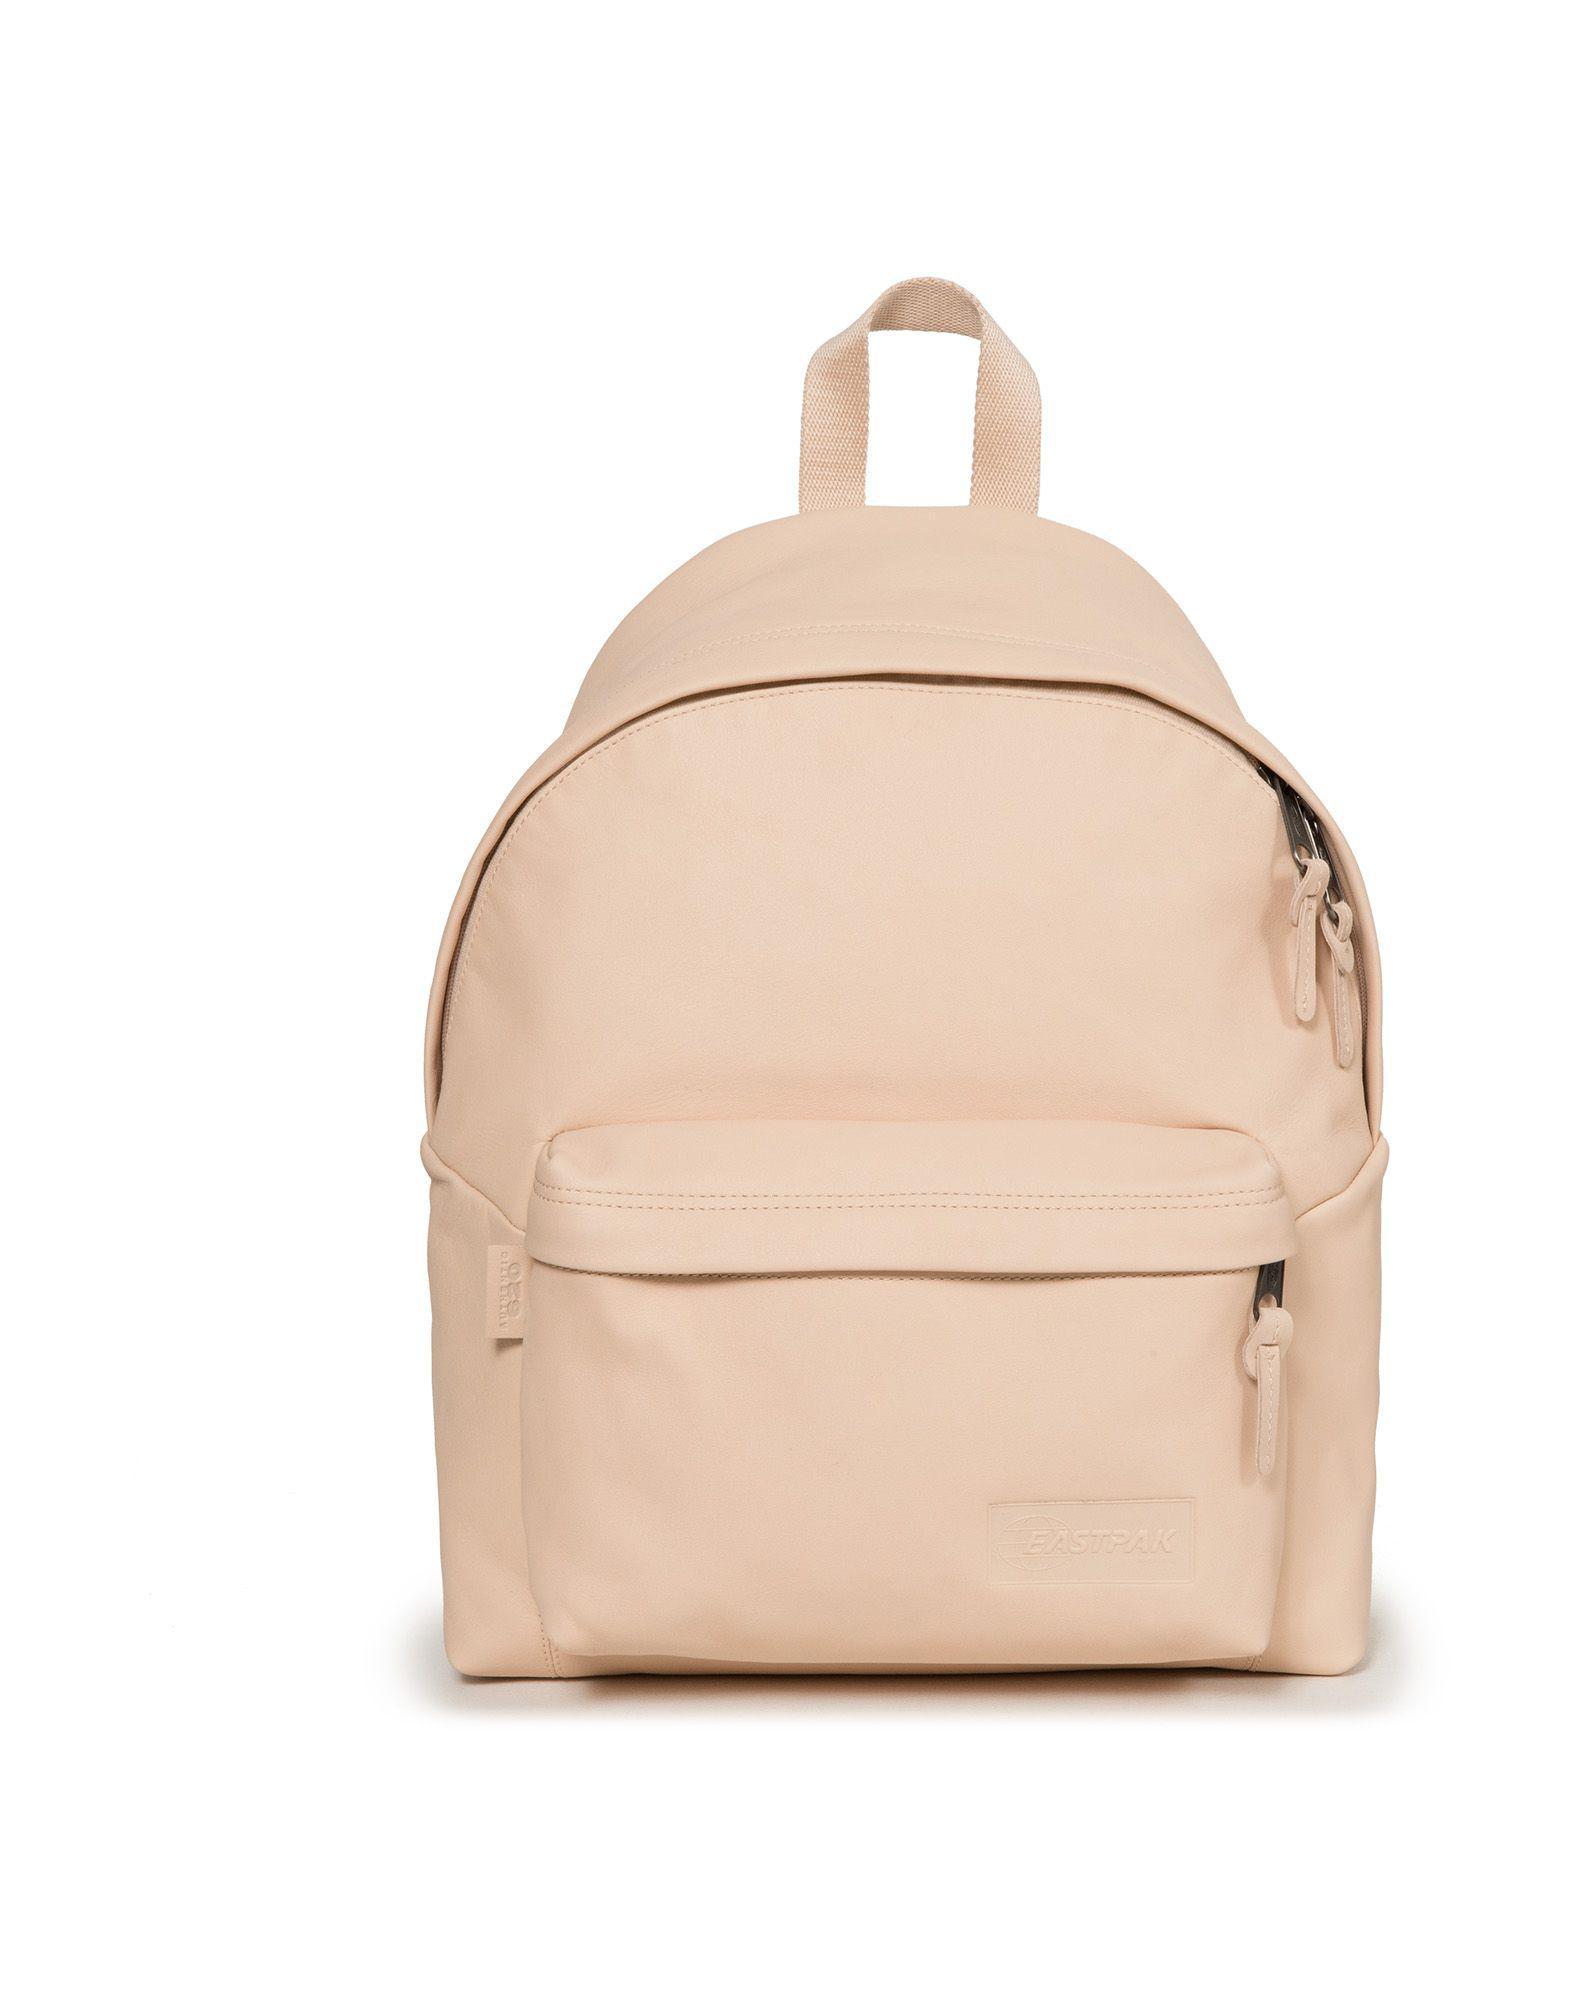 Lyst Bum Bags amp; Backpacks In Eastpak Pink HHgrAFz7